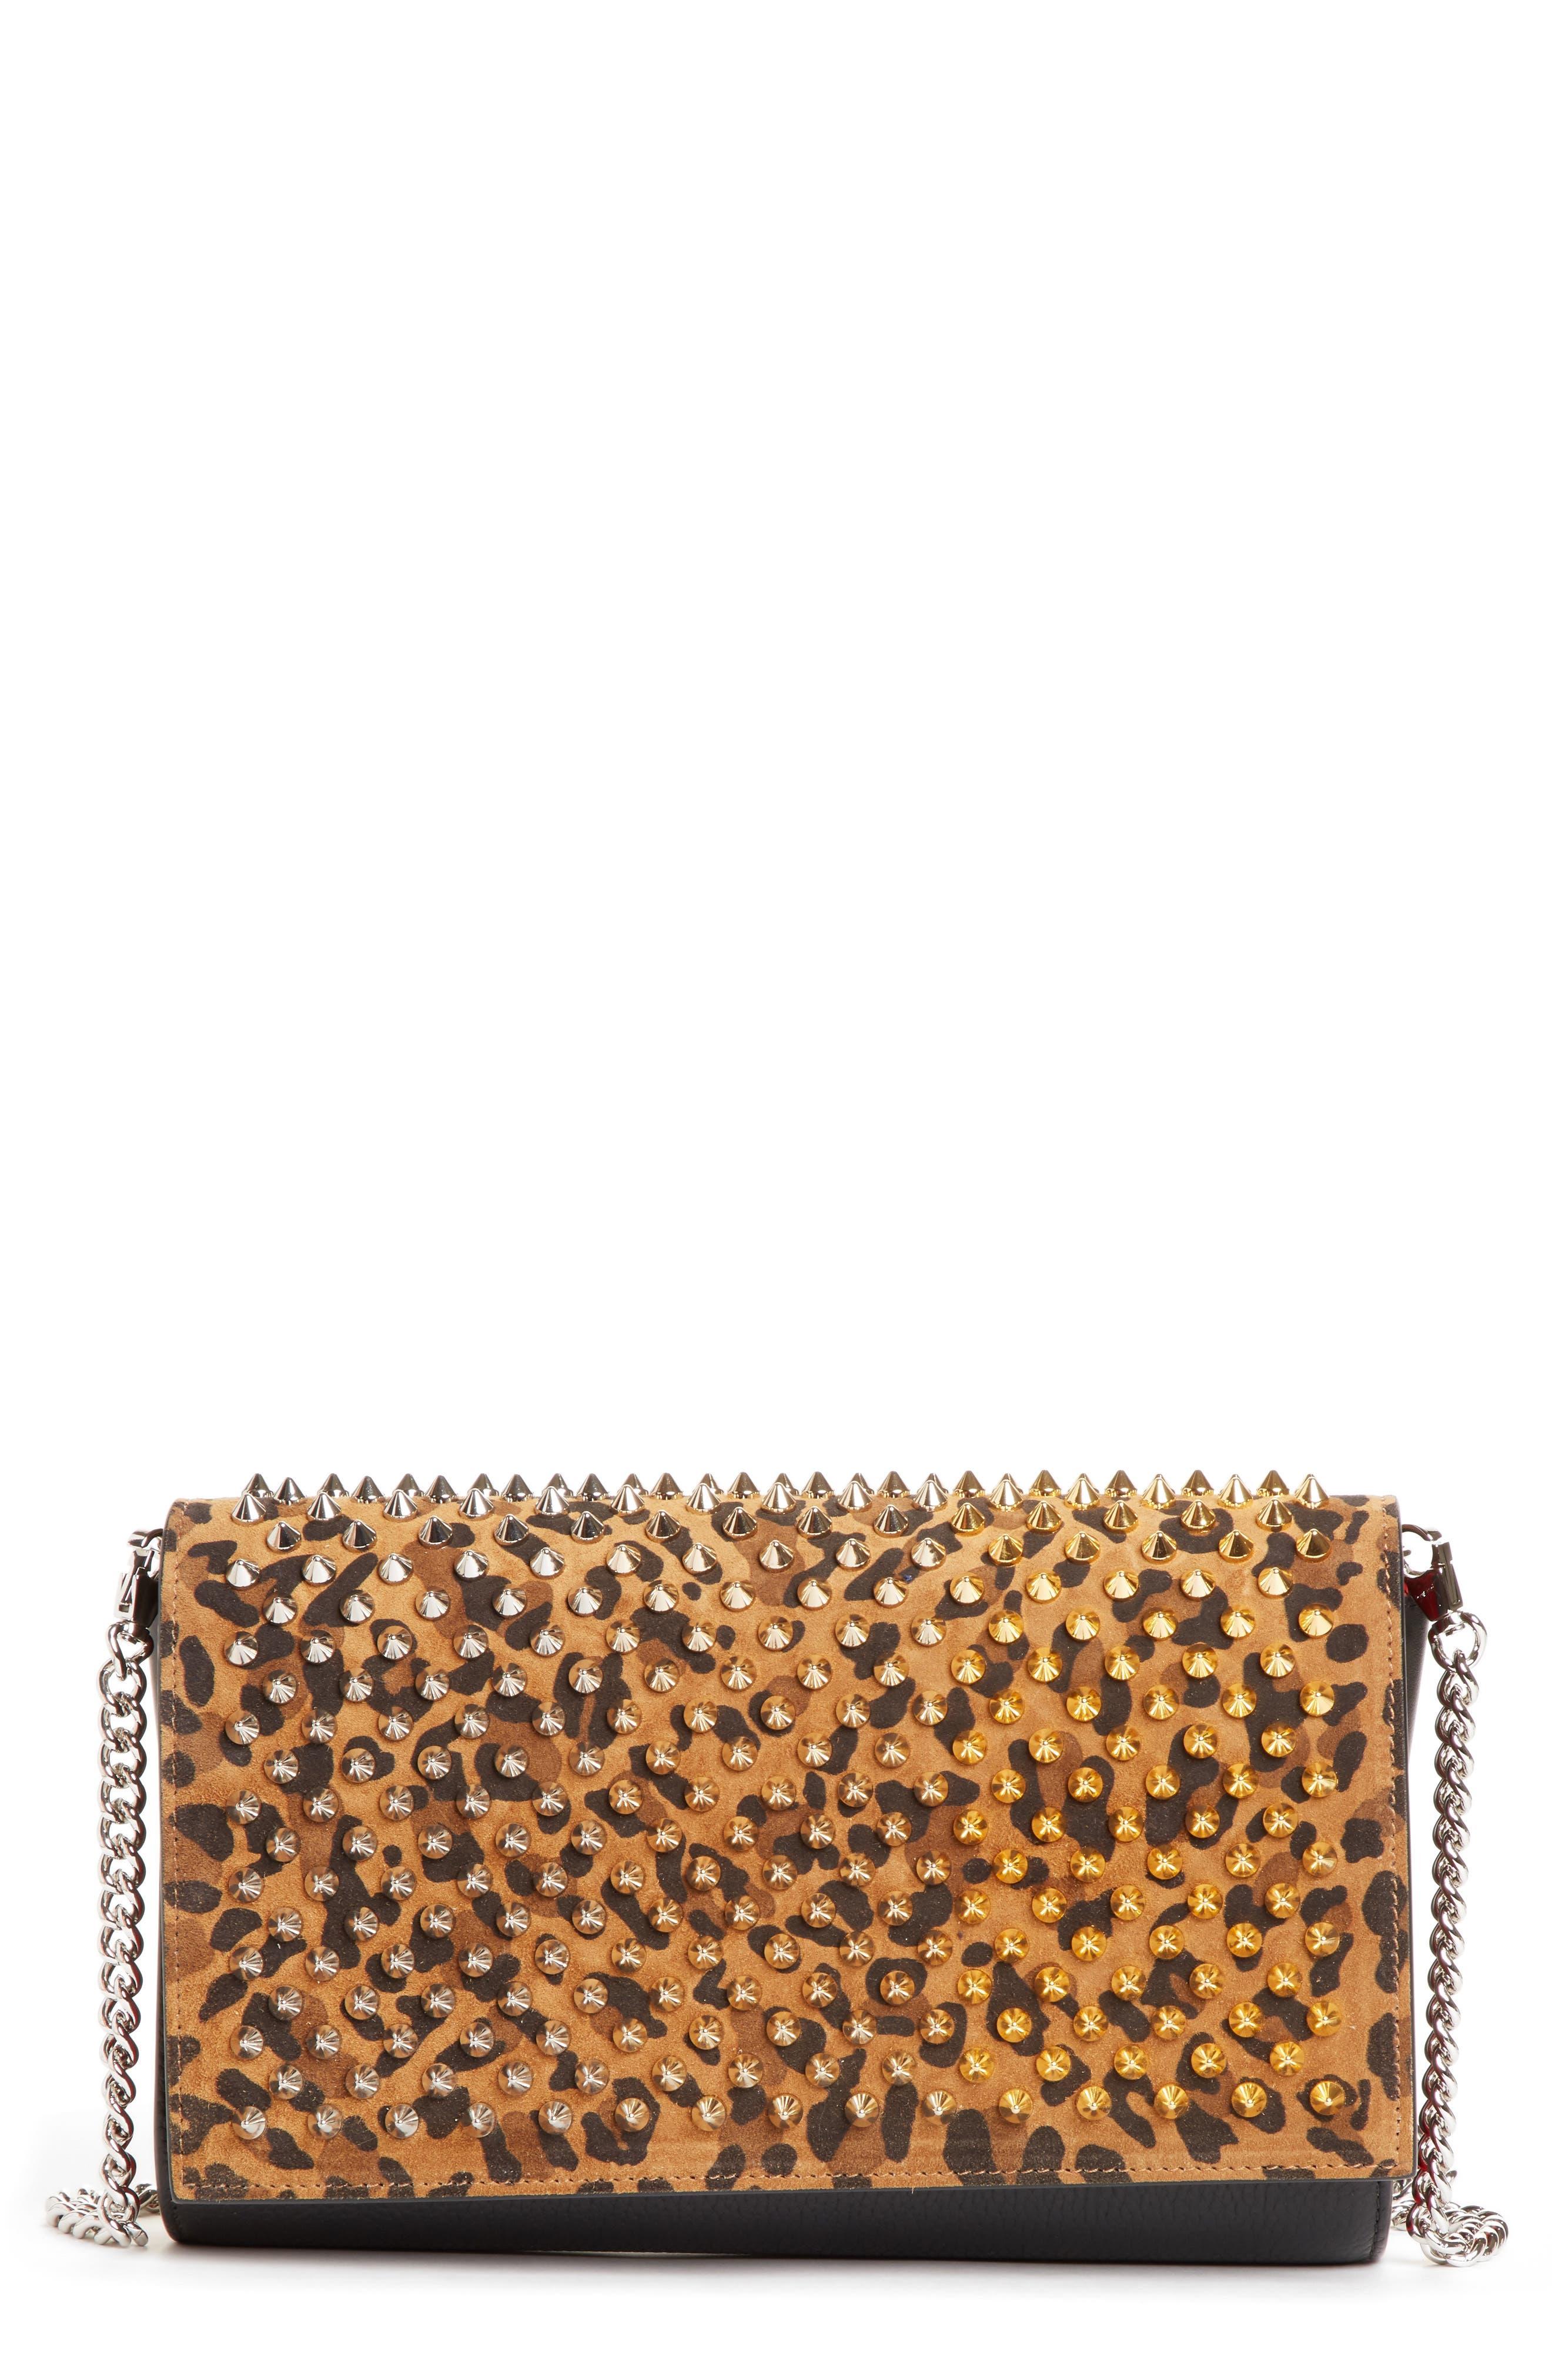 e974efc54b Christian Louboutin Paloma Studded Calfskin Leather Clutch - Brown